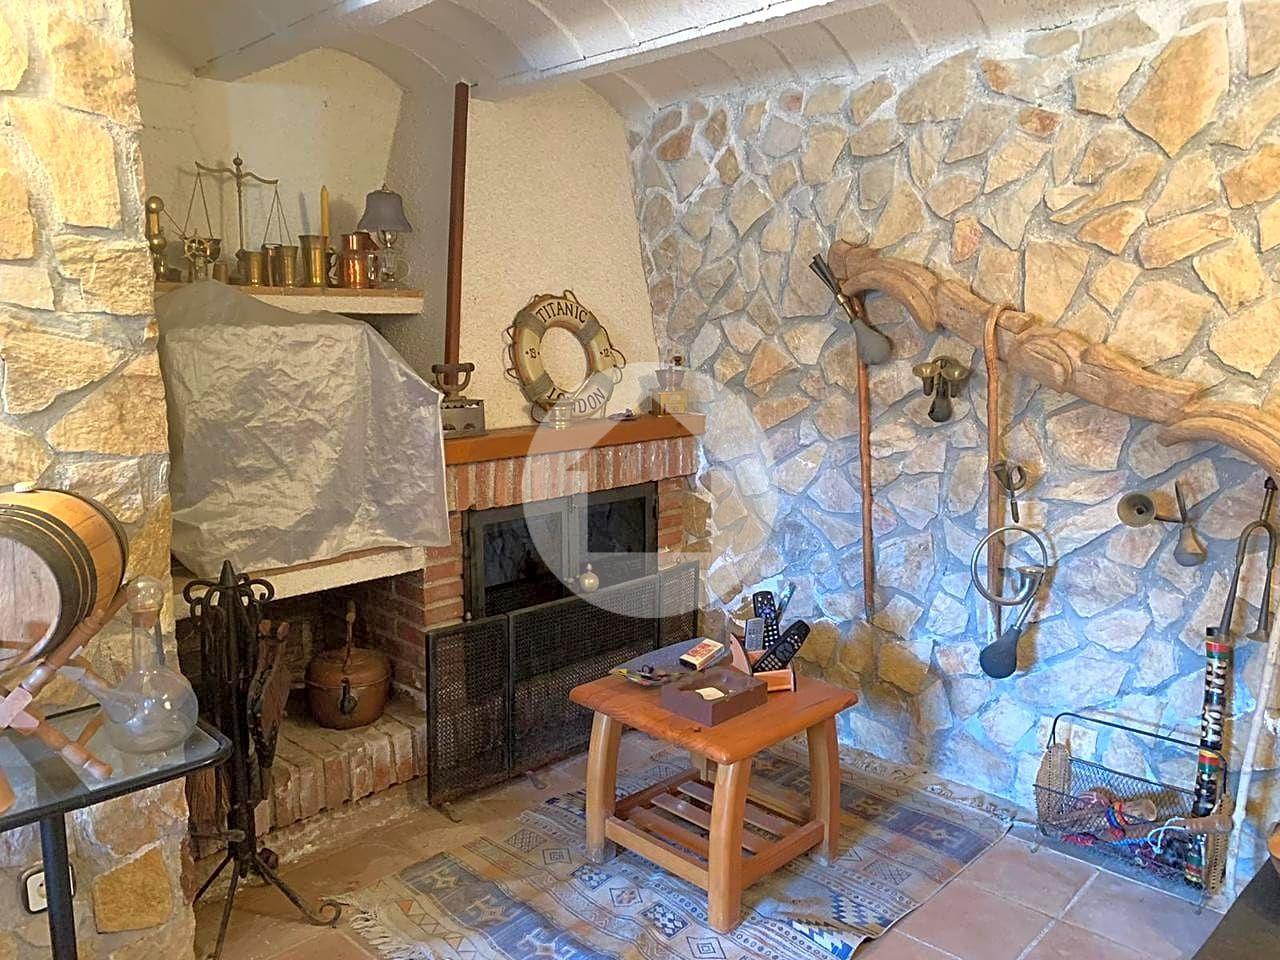 Casa en Caldes de Malavella. Houscat.com te presenta esta casa que se encuentra en can carbon